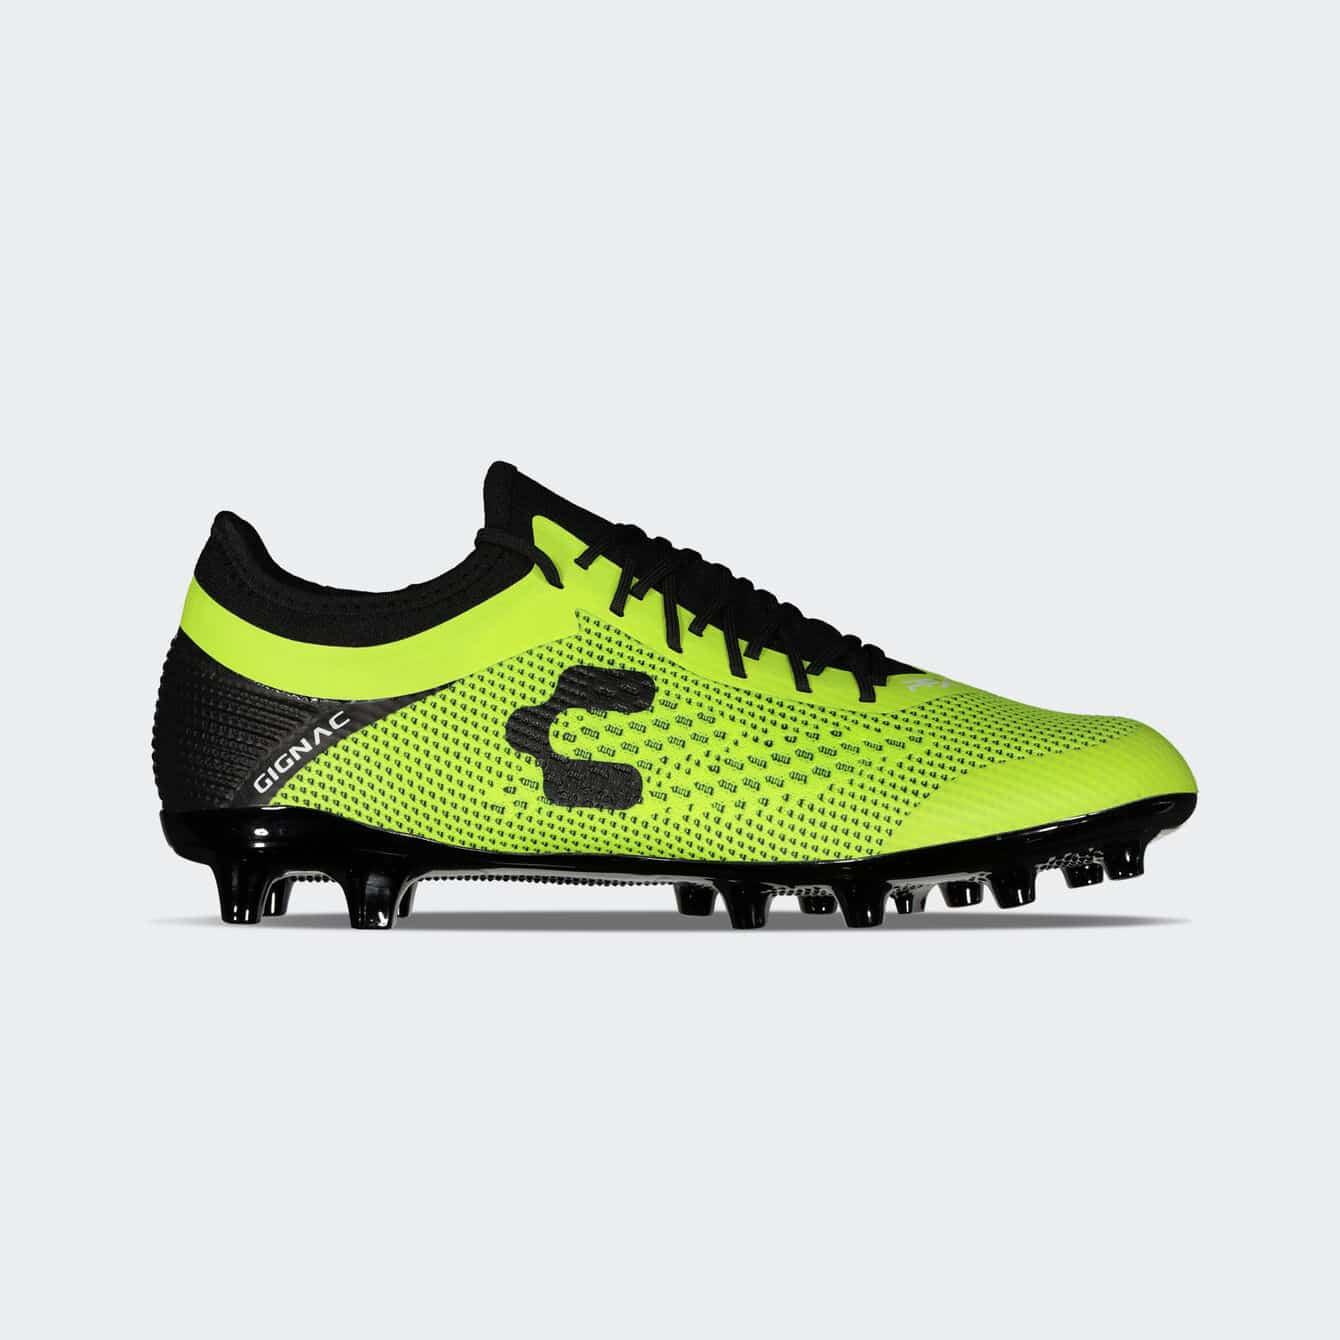 chaussures-andre-pierre-gignac-charly-futbol-pfx-5